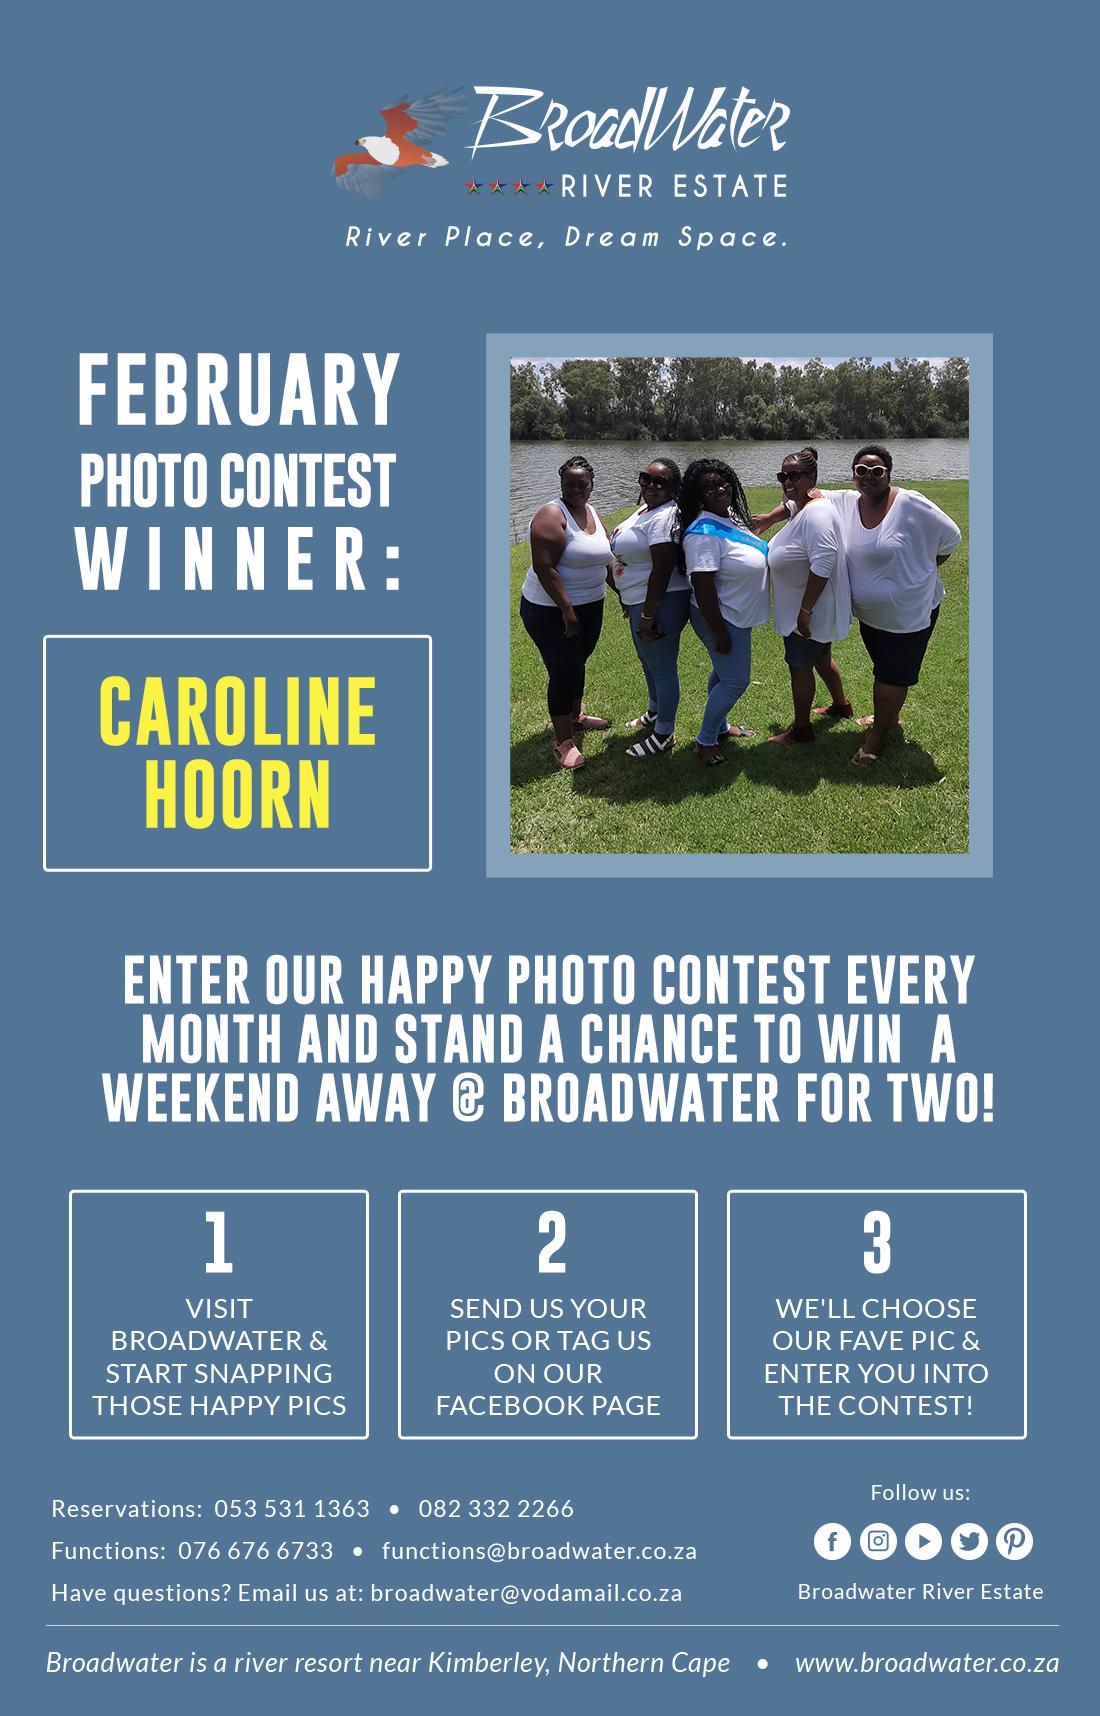 february photo contest winner